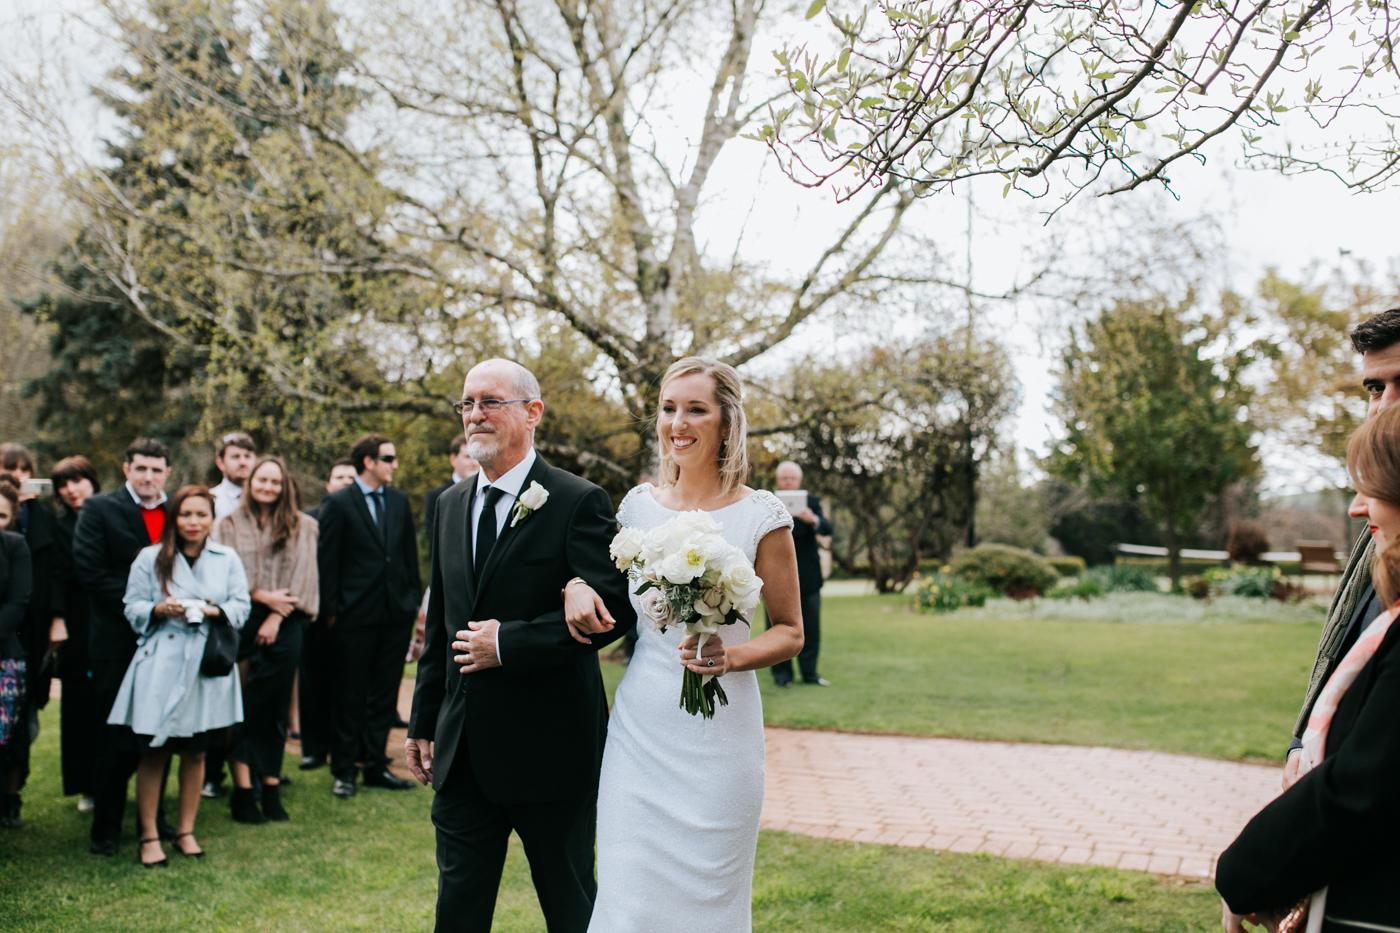 Bridget & James - Orange Country Wedding - Samantha Heather Photography-26.jpg